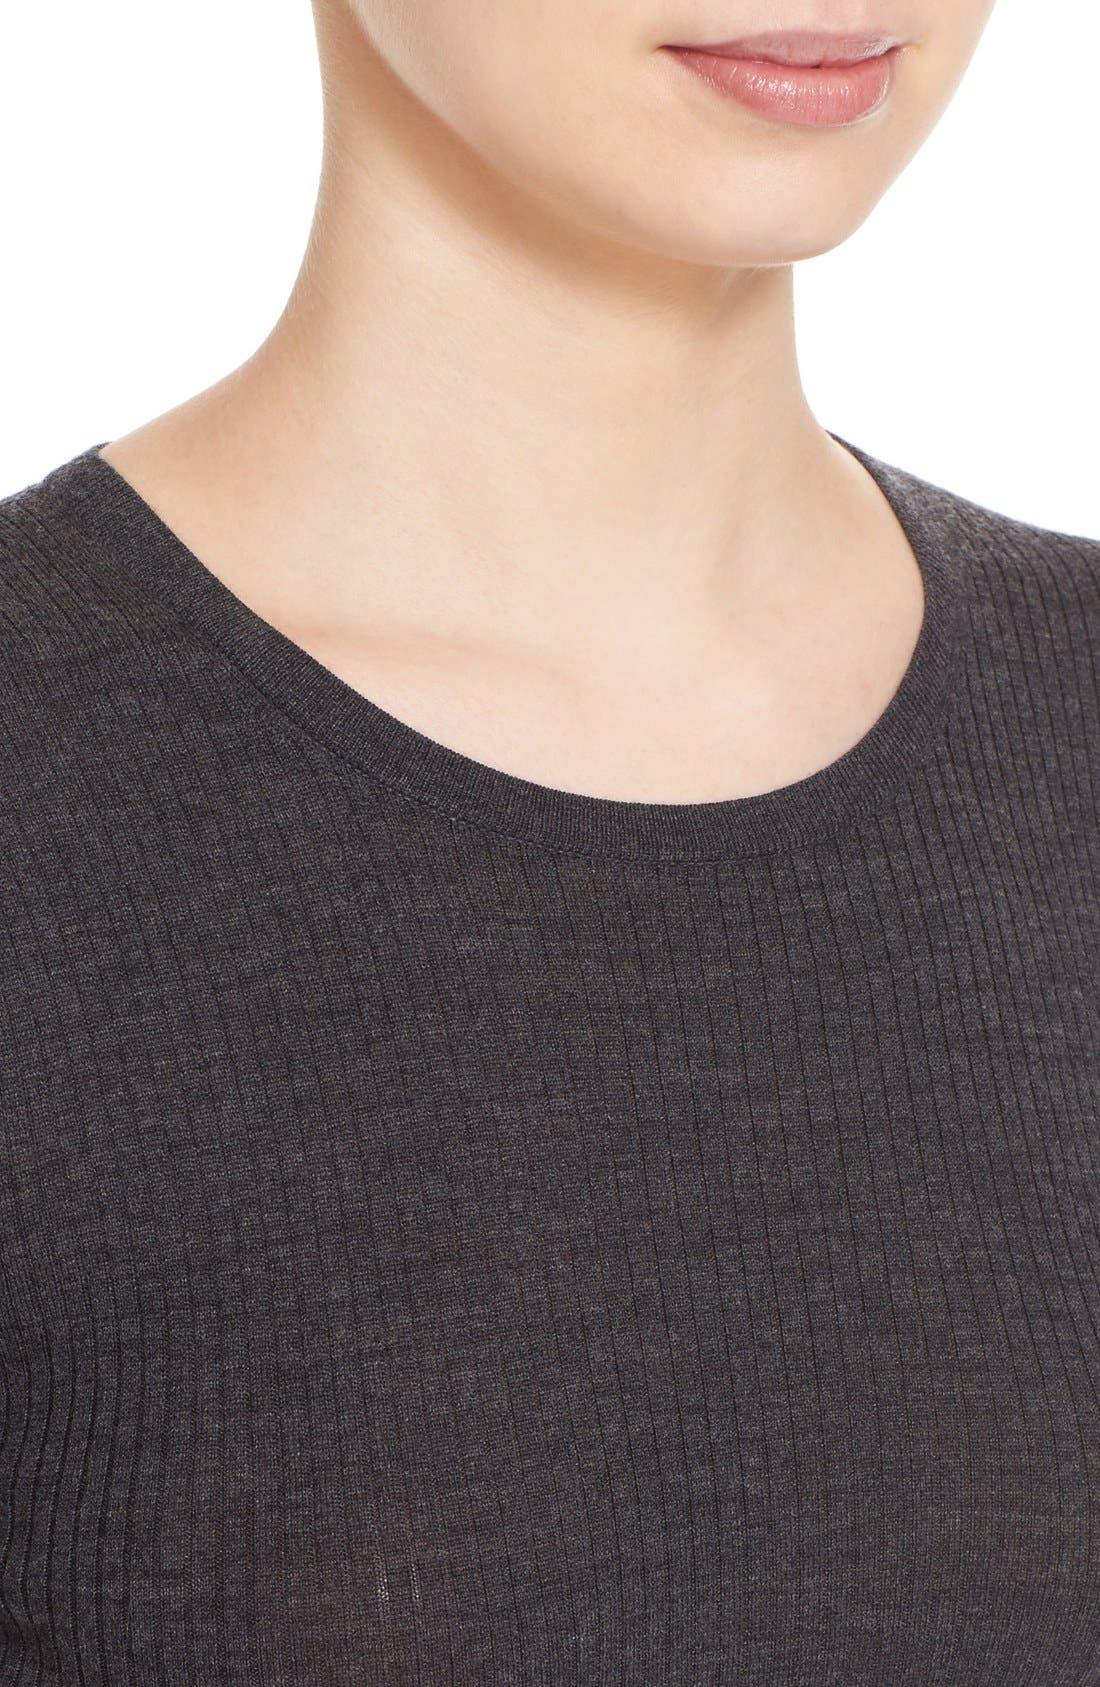 Alternate Image 4  - Theory 'Mirzi' Rib Knit Merino Wool Sweater